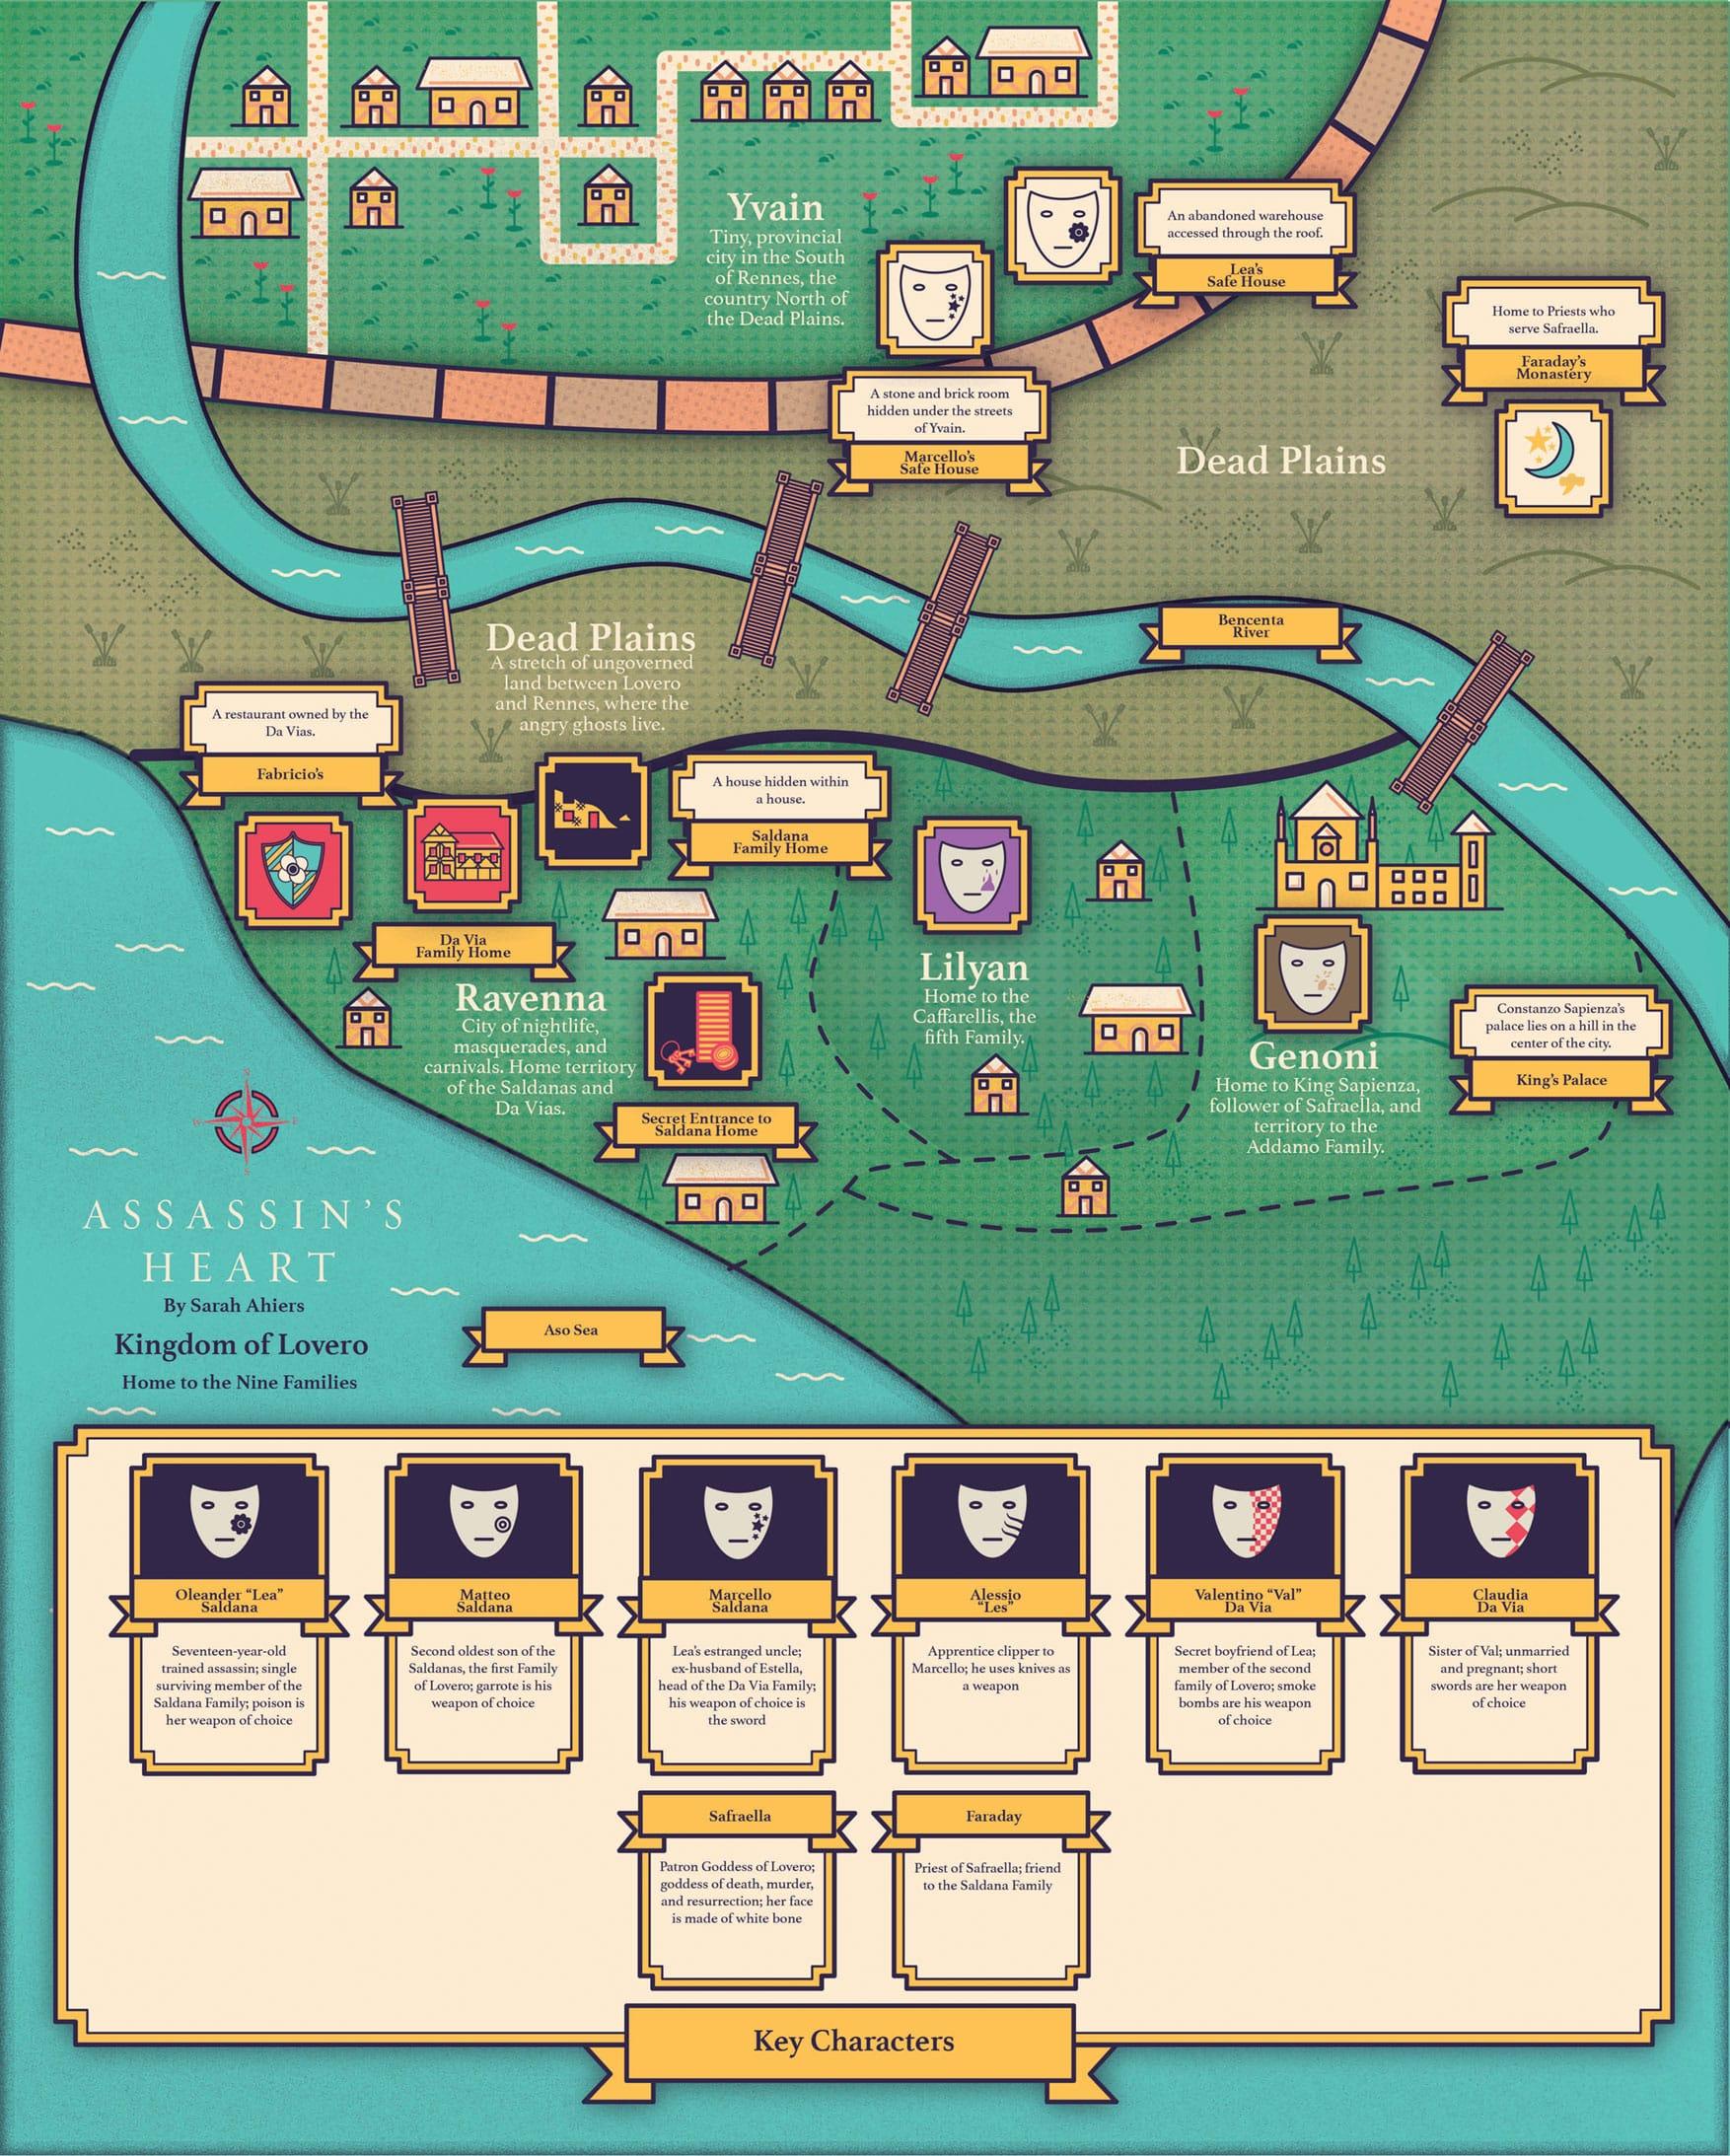 Assassin's Heart world map infographic